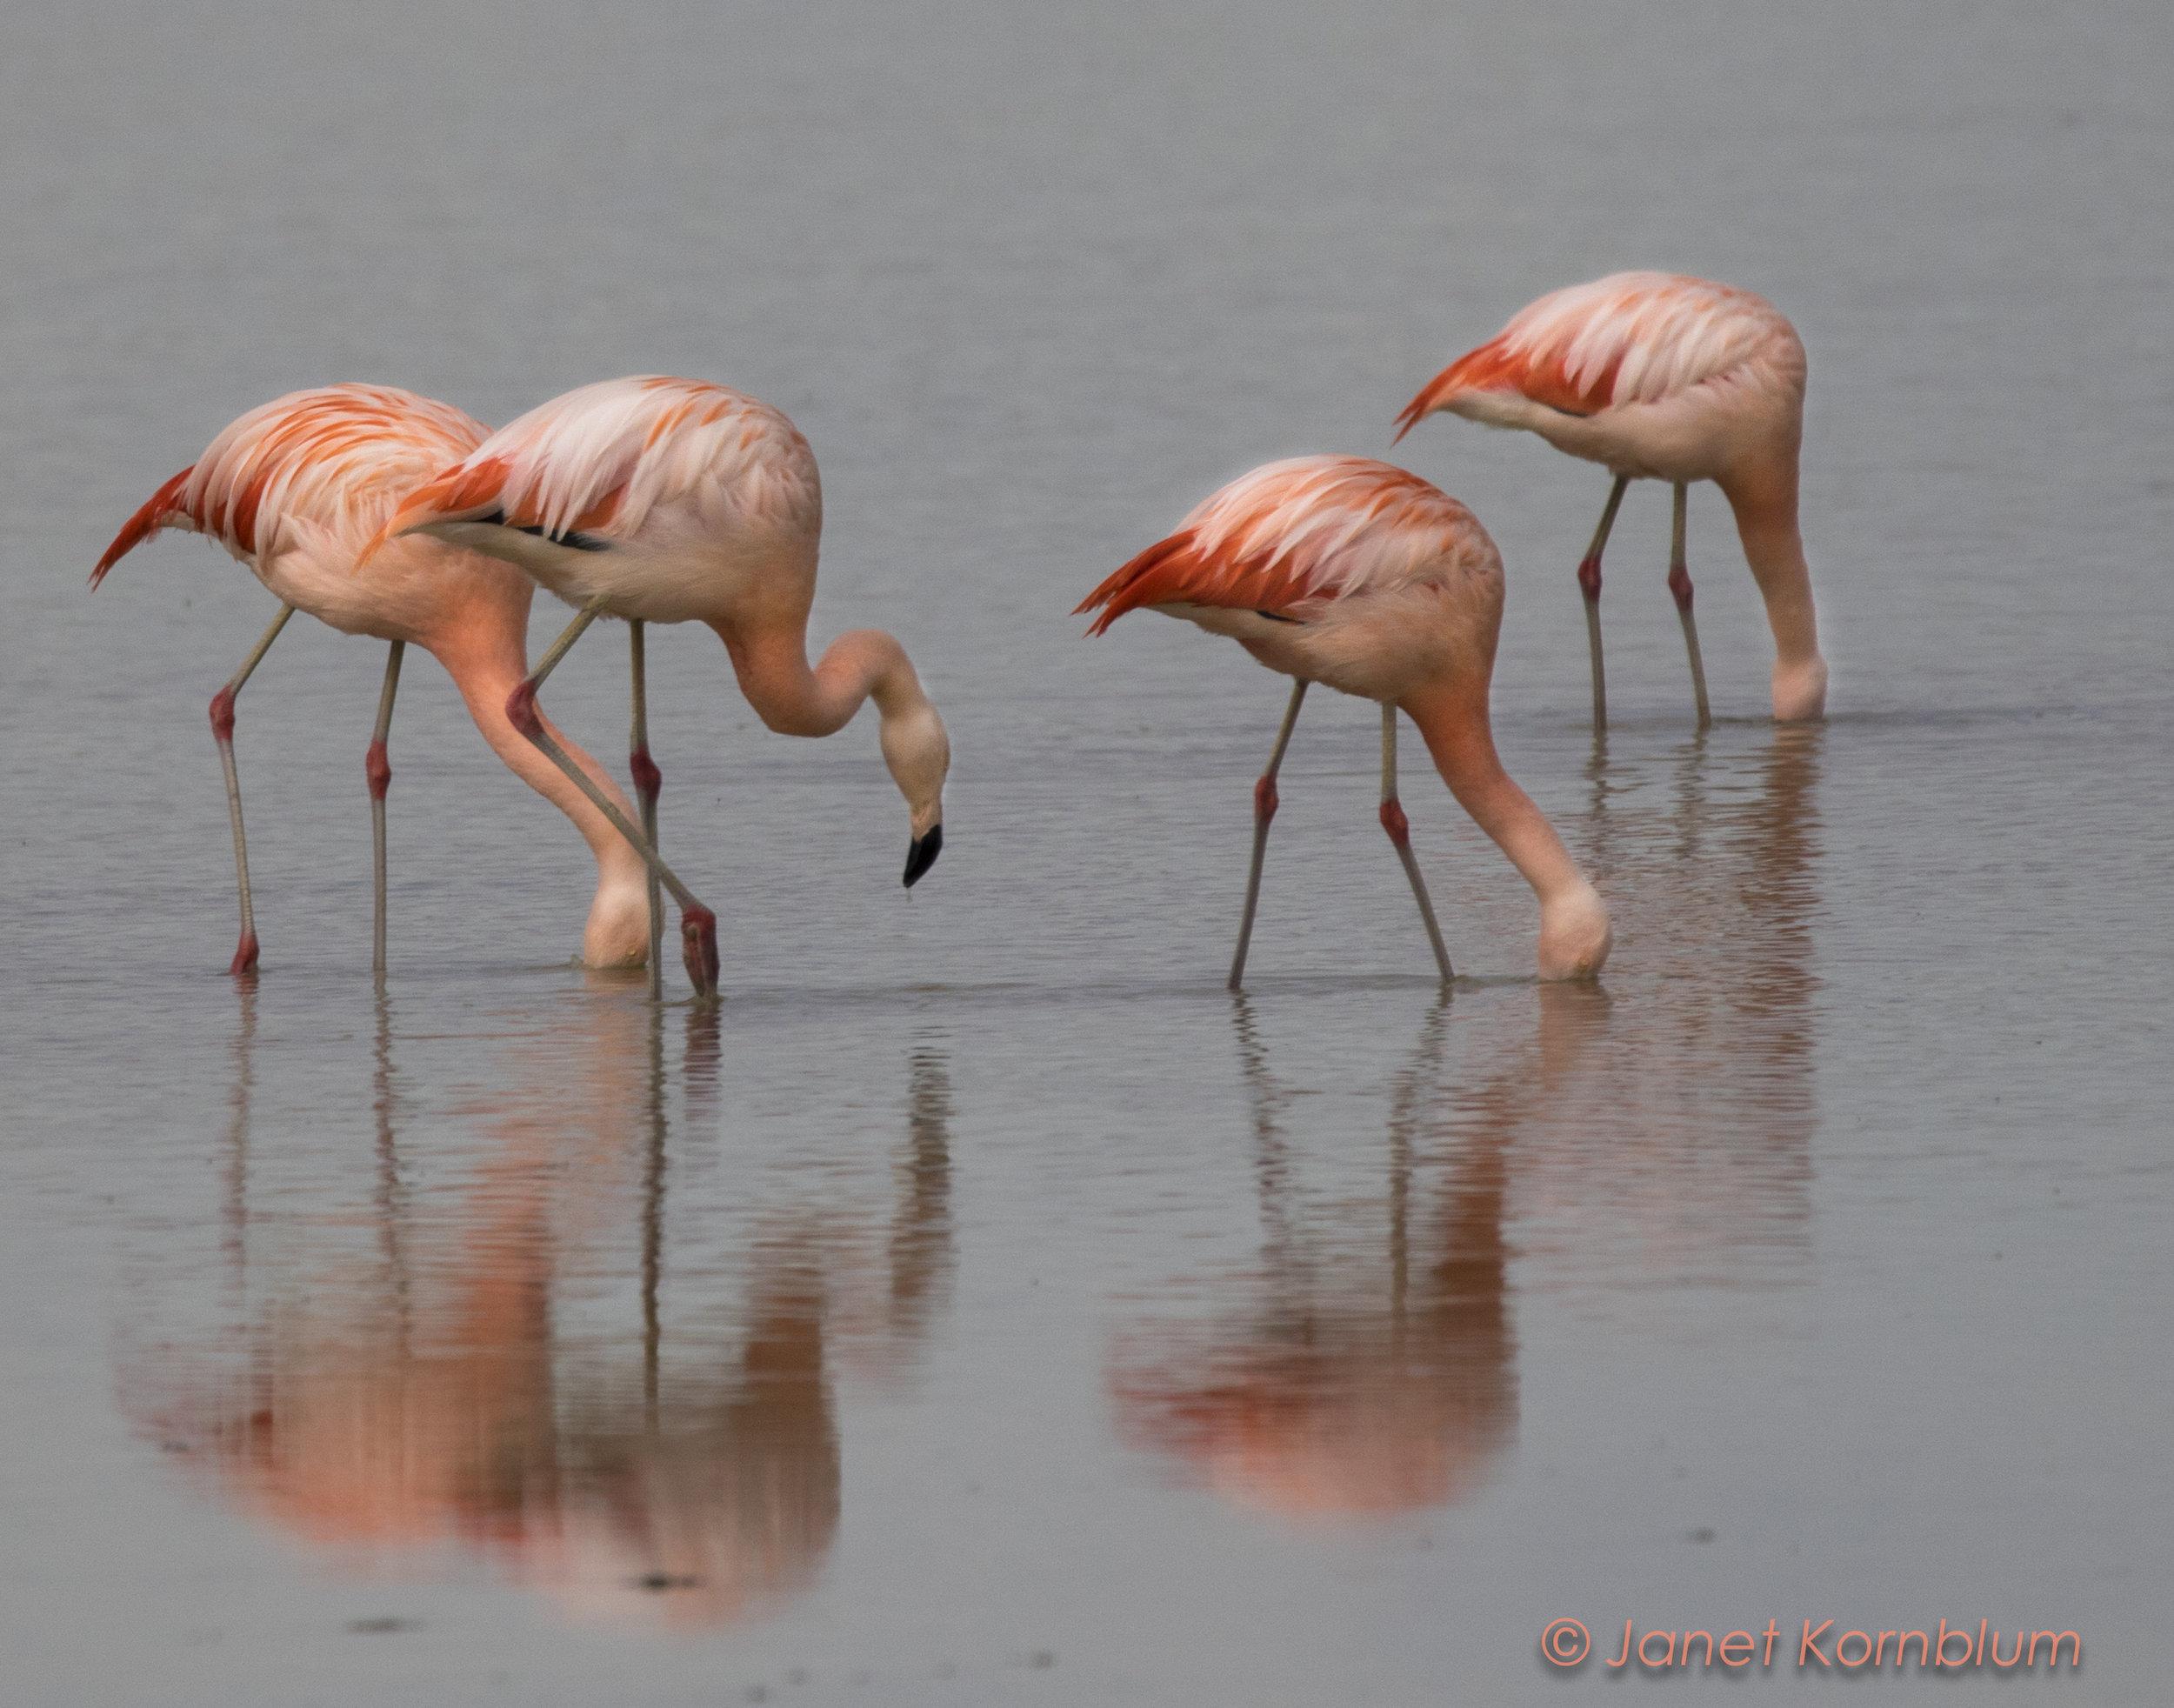 Chilean flamingoes 11x14.3-2.jpg